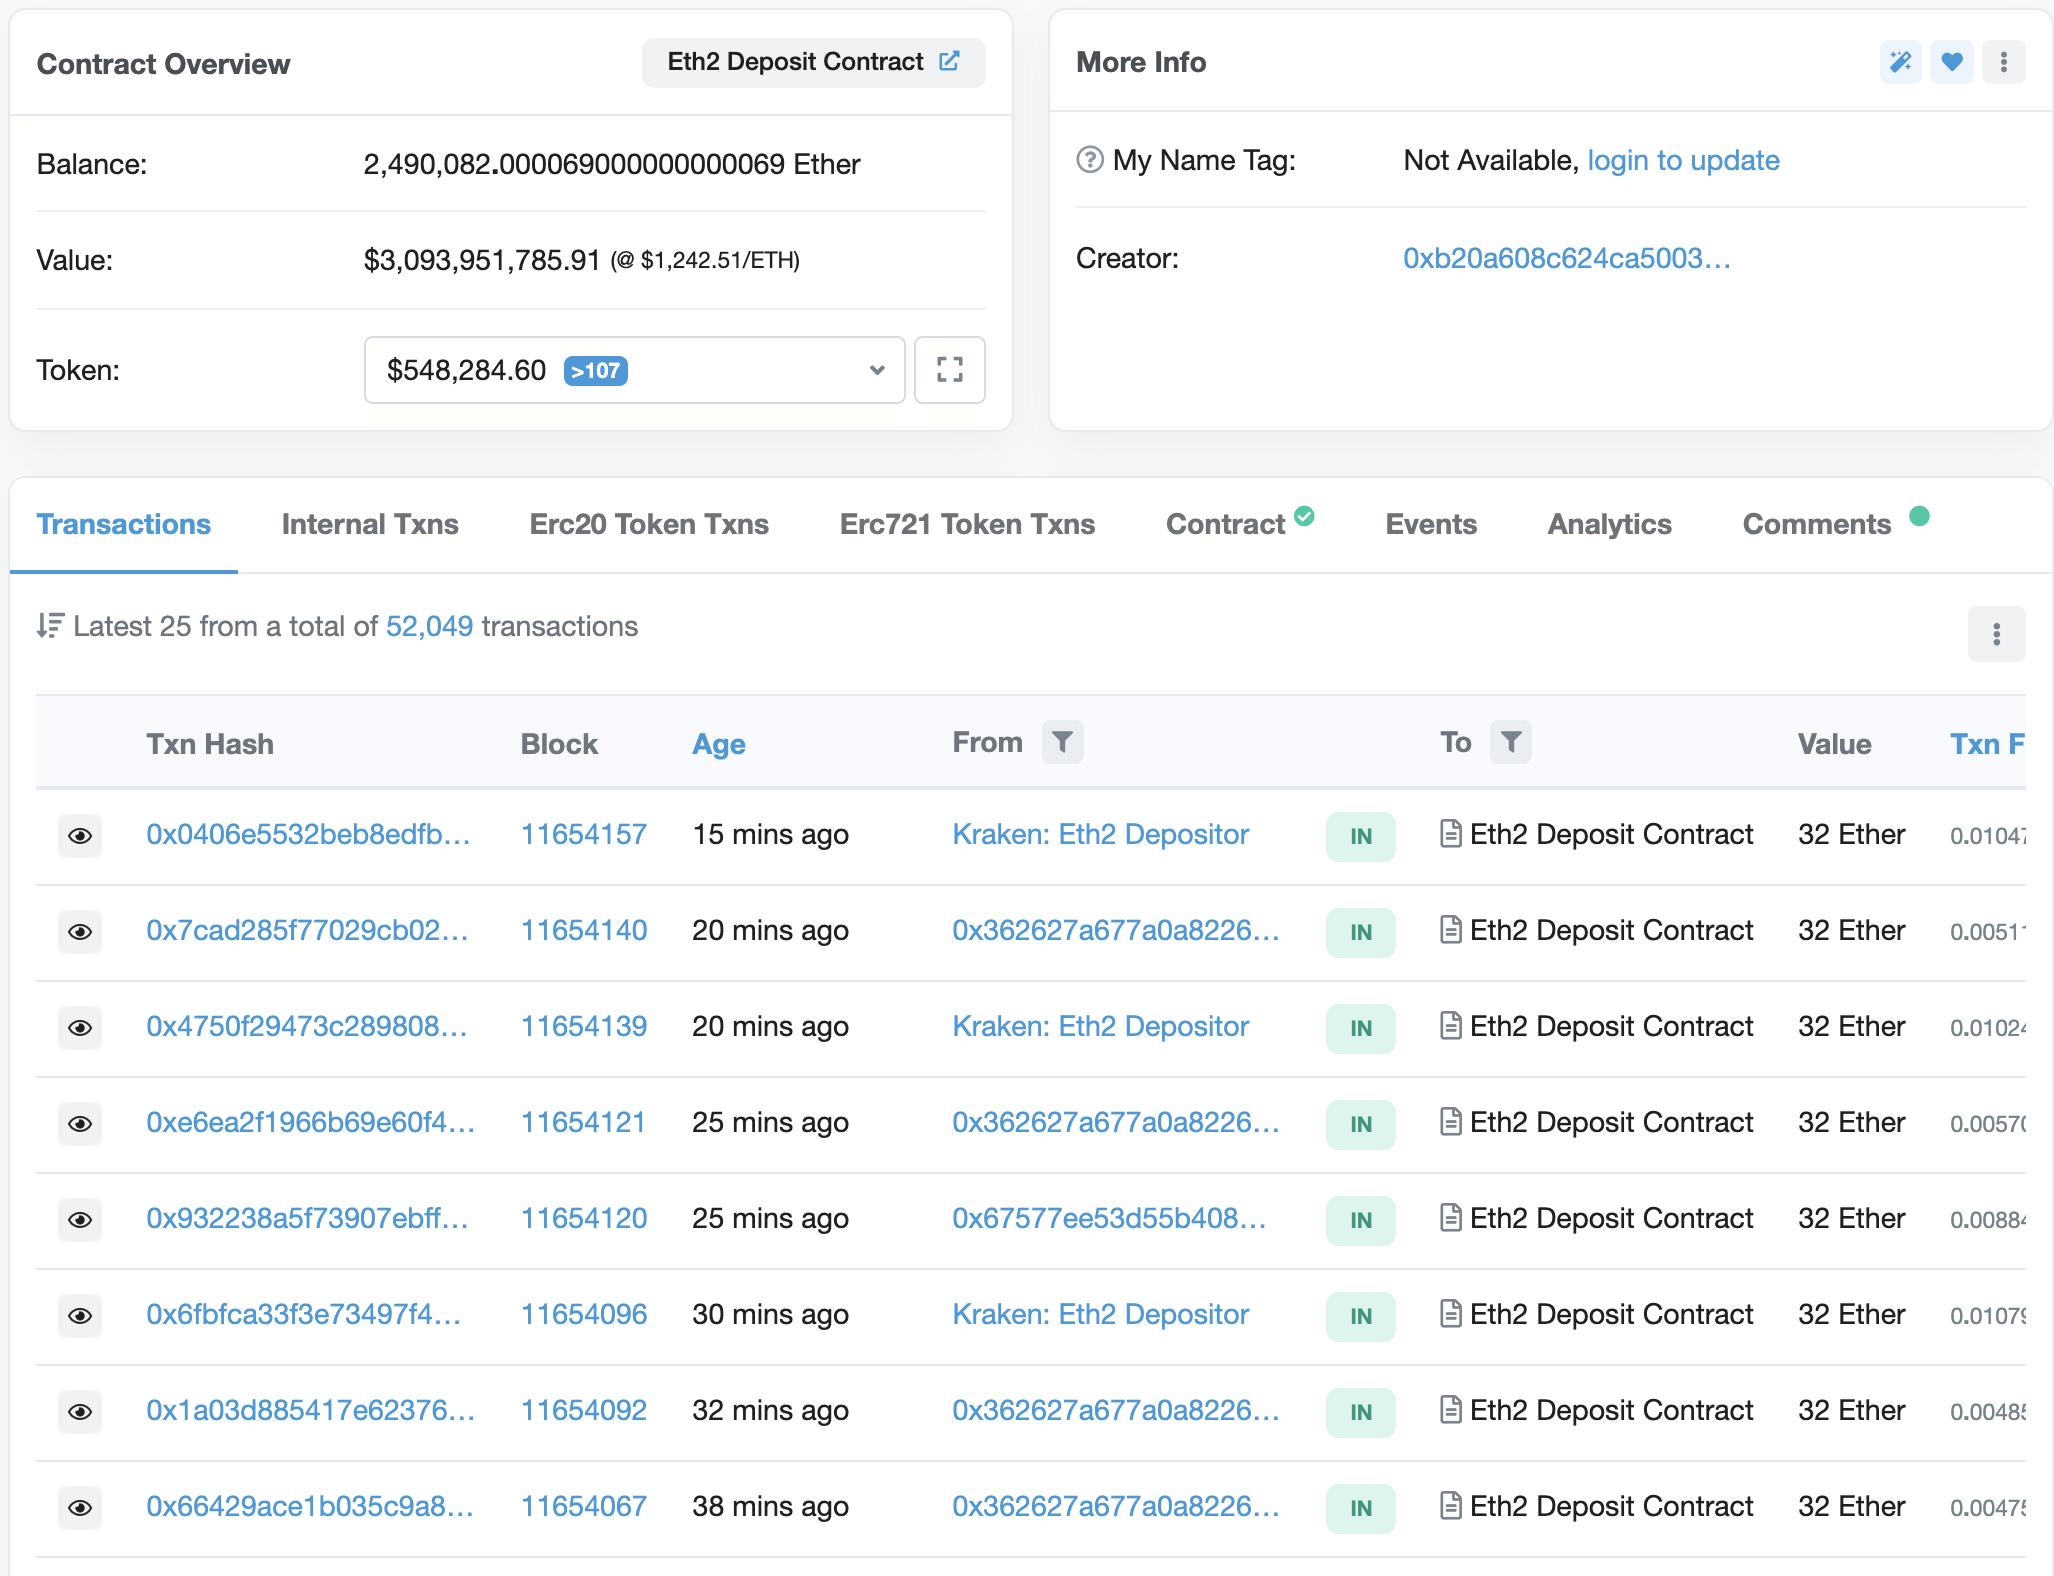 Ethereum 2.0 stakers cross $3 billion, Jan 2021